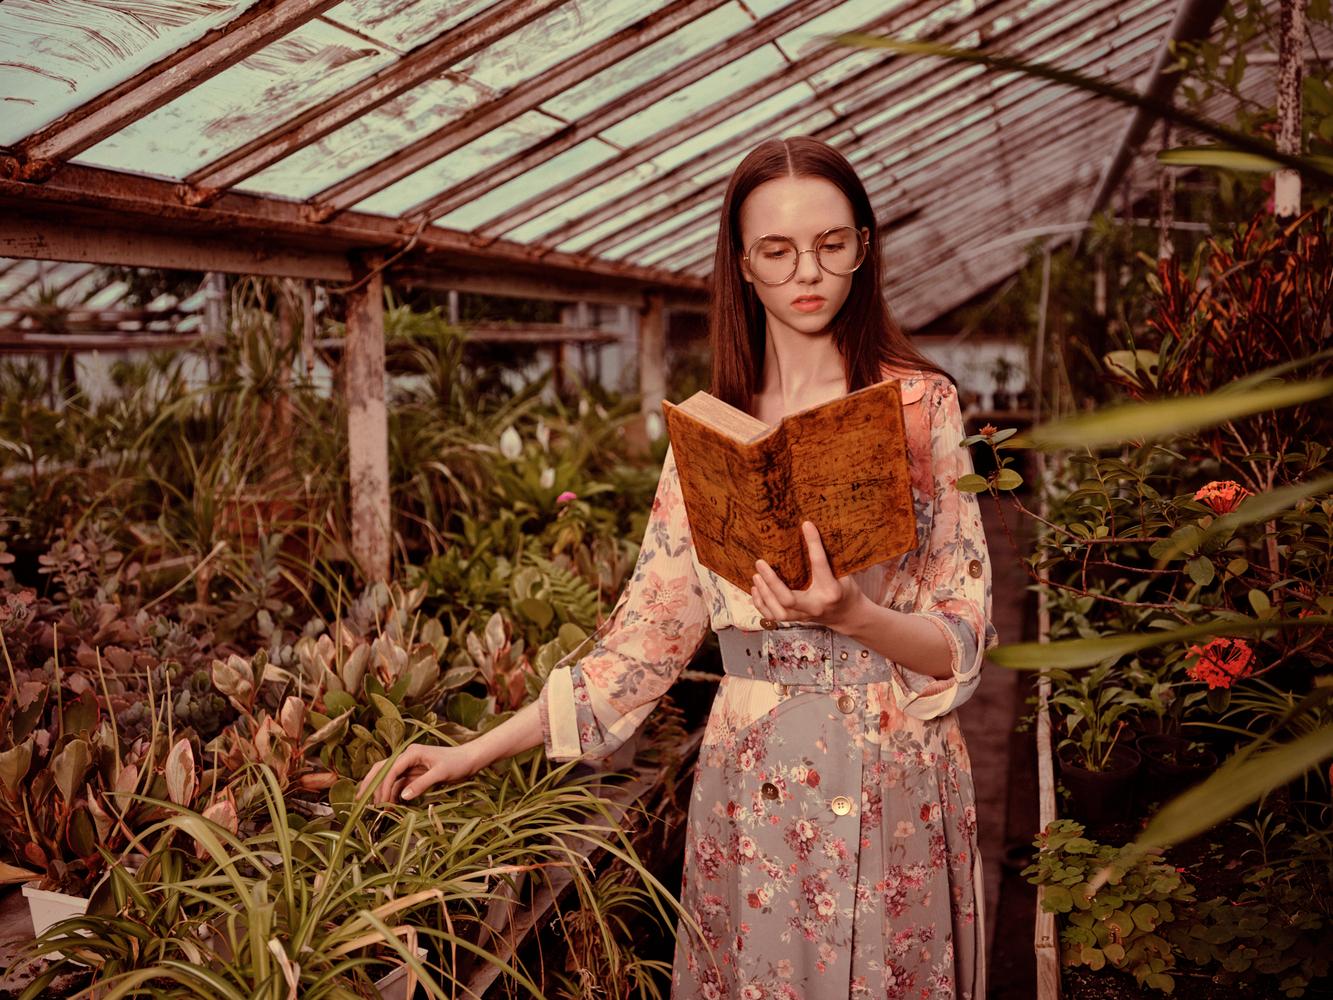 Secret Garden by Blake Aghili